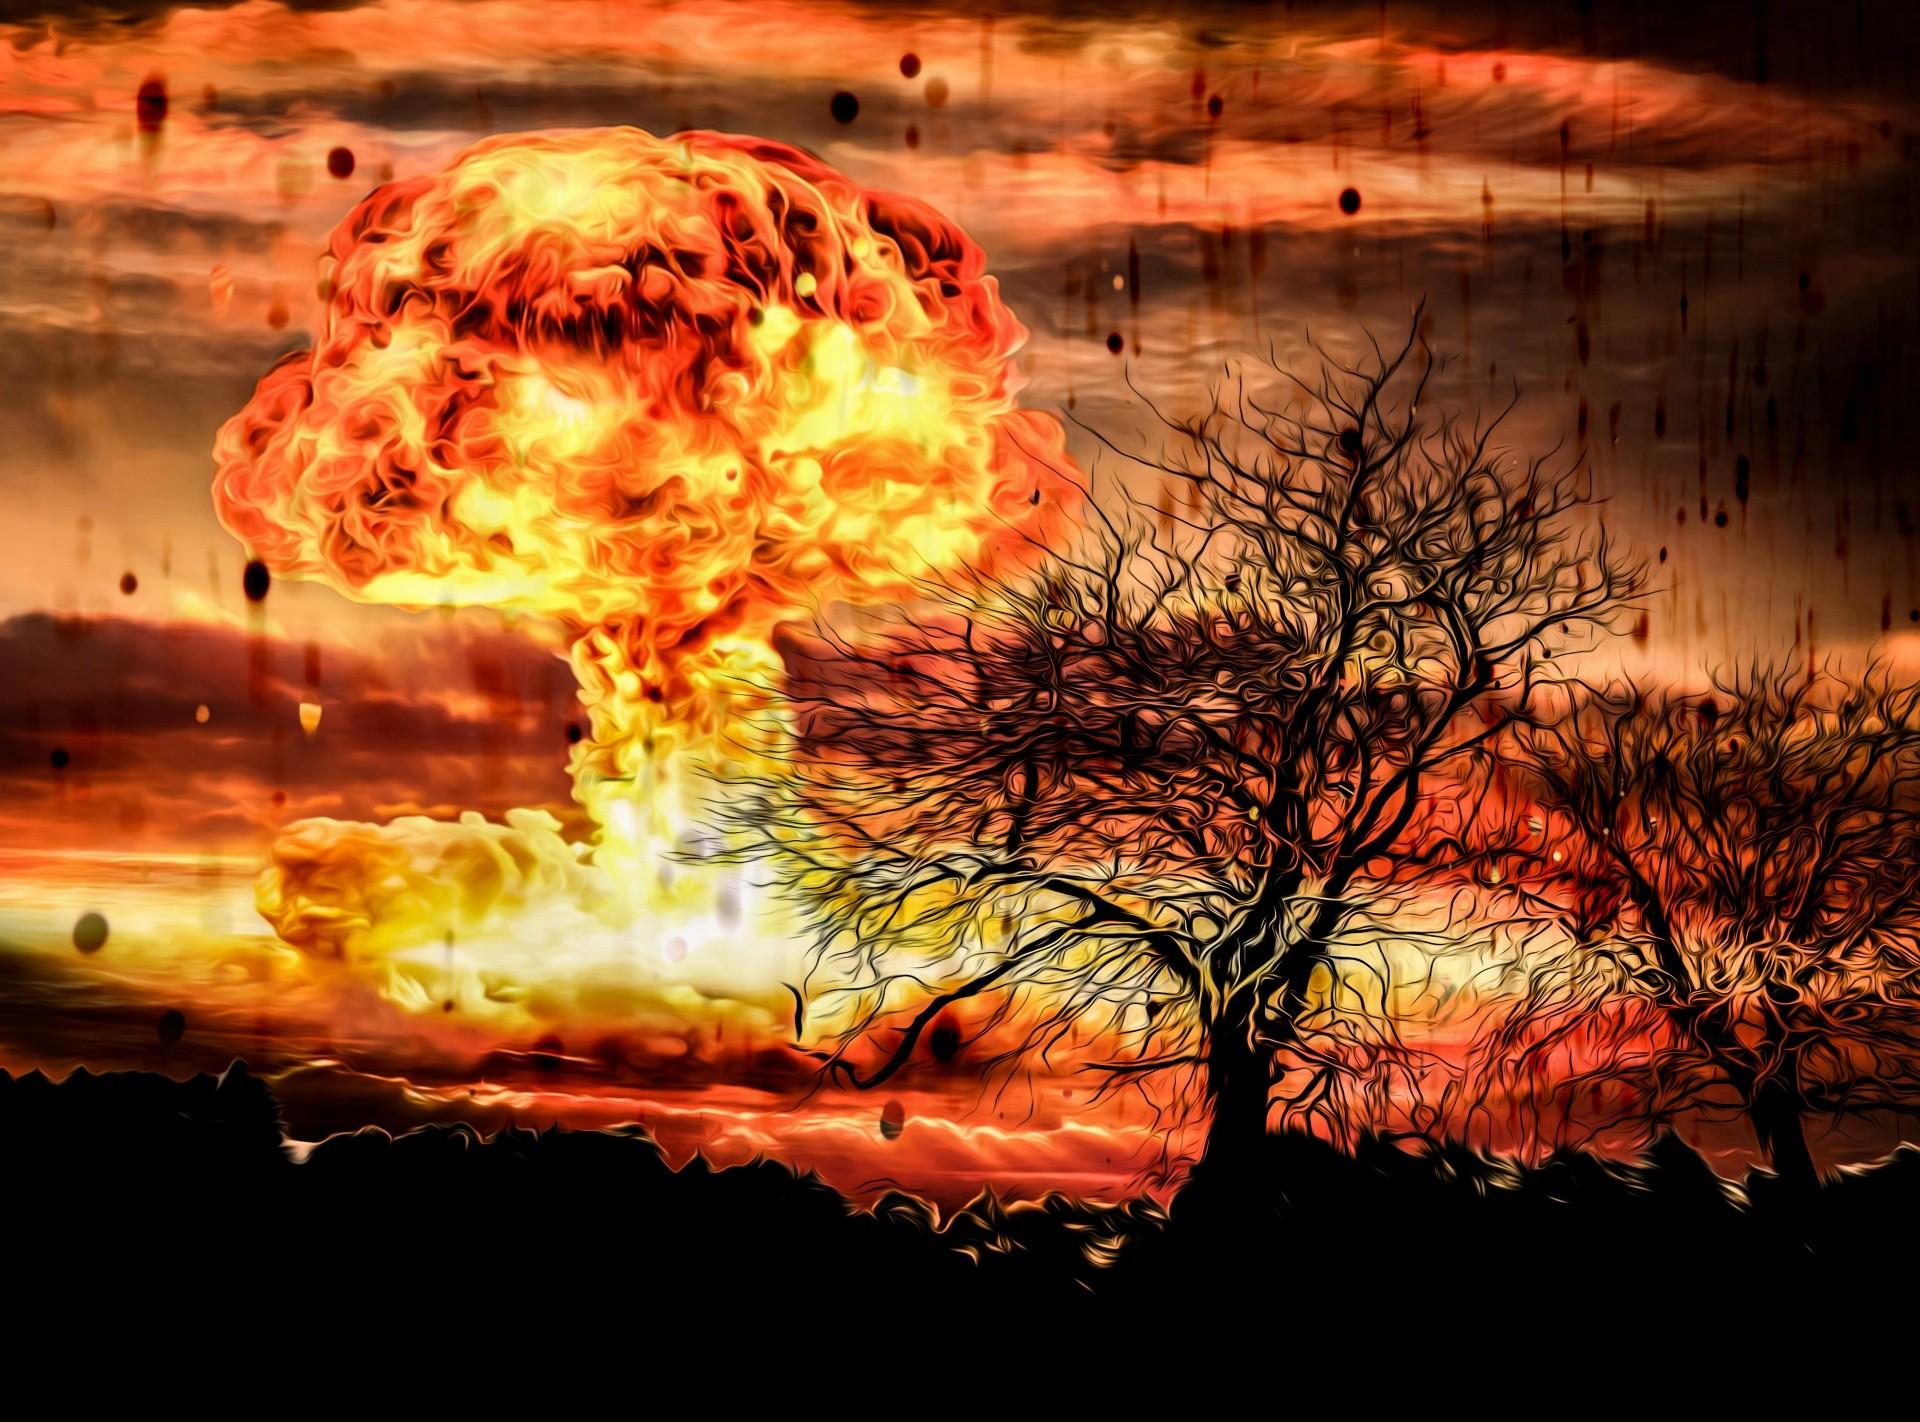 Boletim de ameaças nucleares considera o momento atual muito perigoso (Foto: Public Domain Pictures)